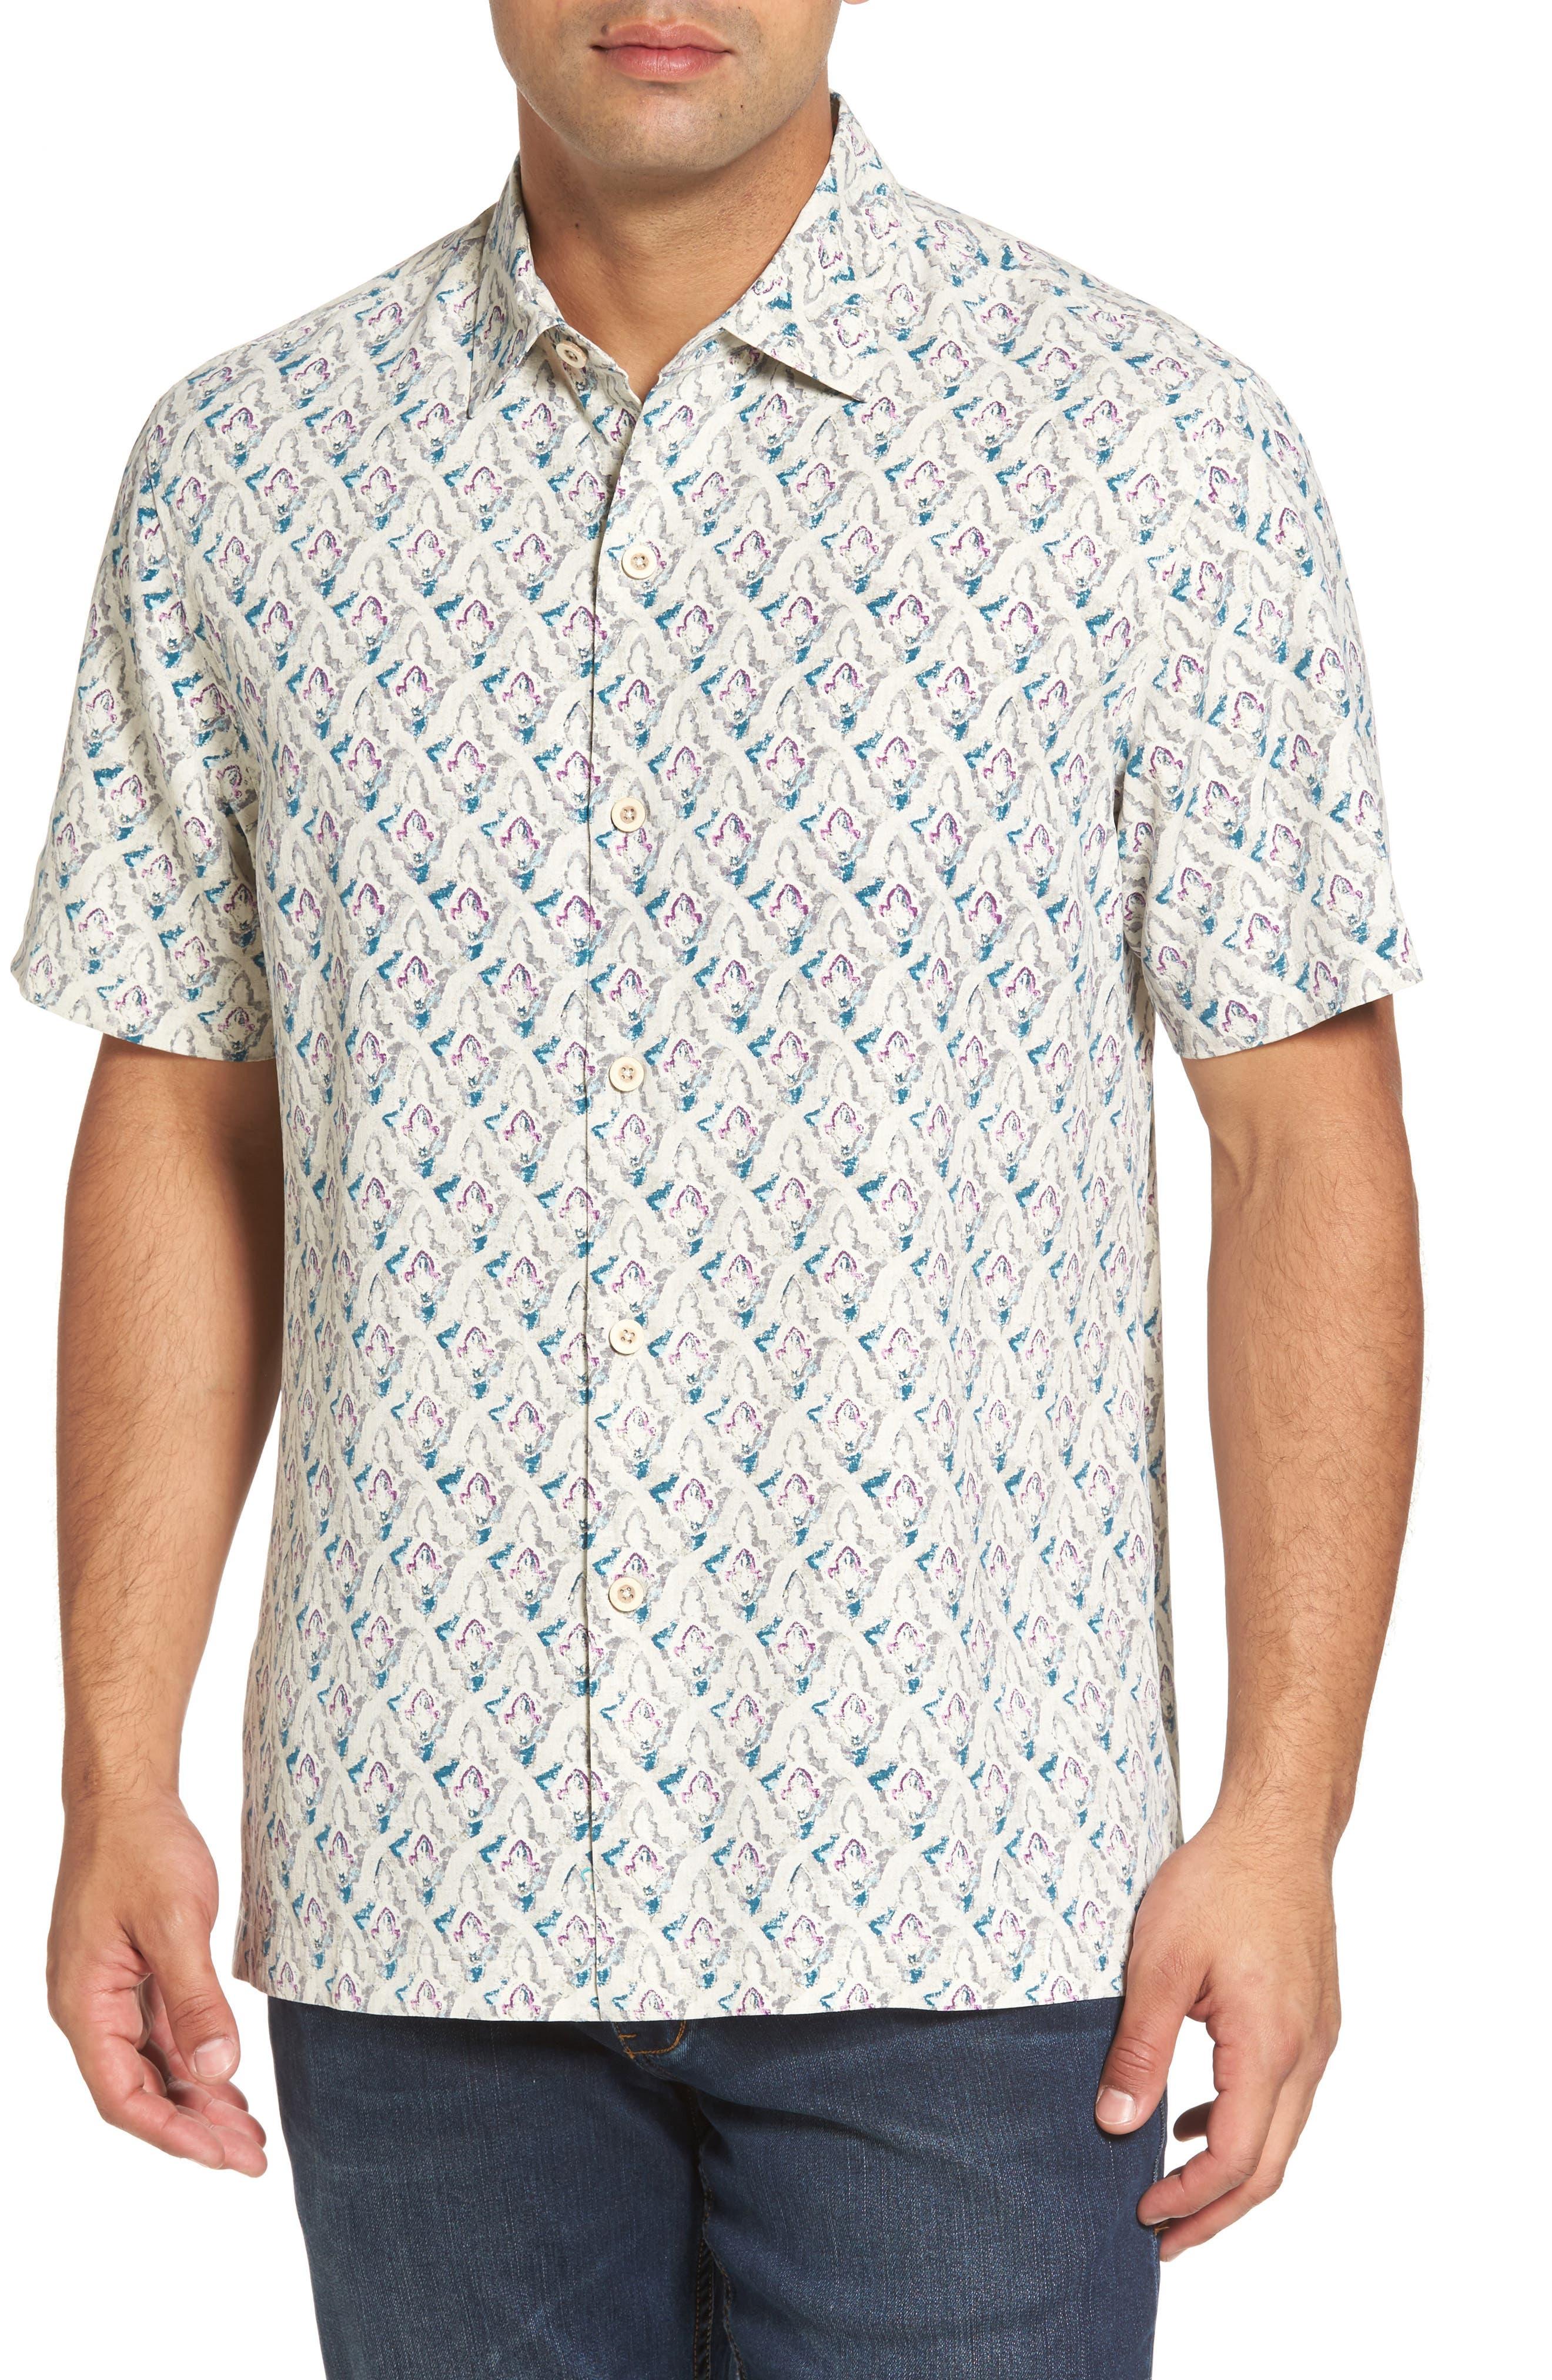 Main Image - Tommy Bahama Alcazar Tiles Standard Fit Silk Camp Shirt